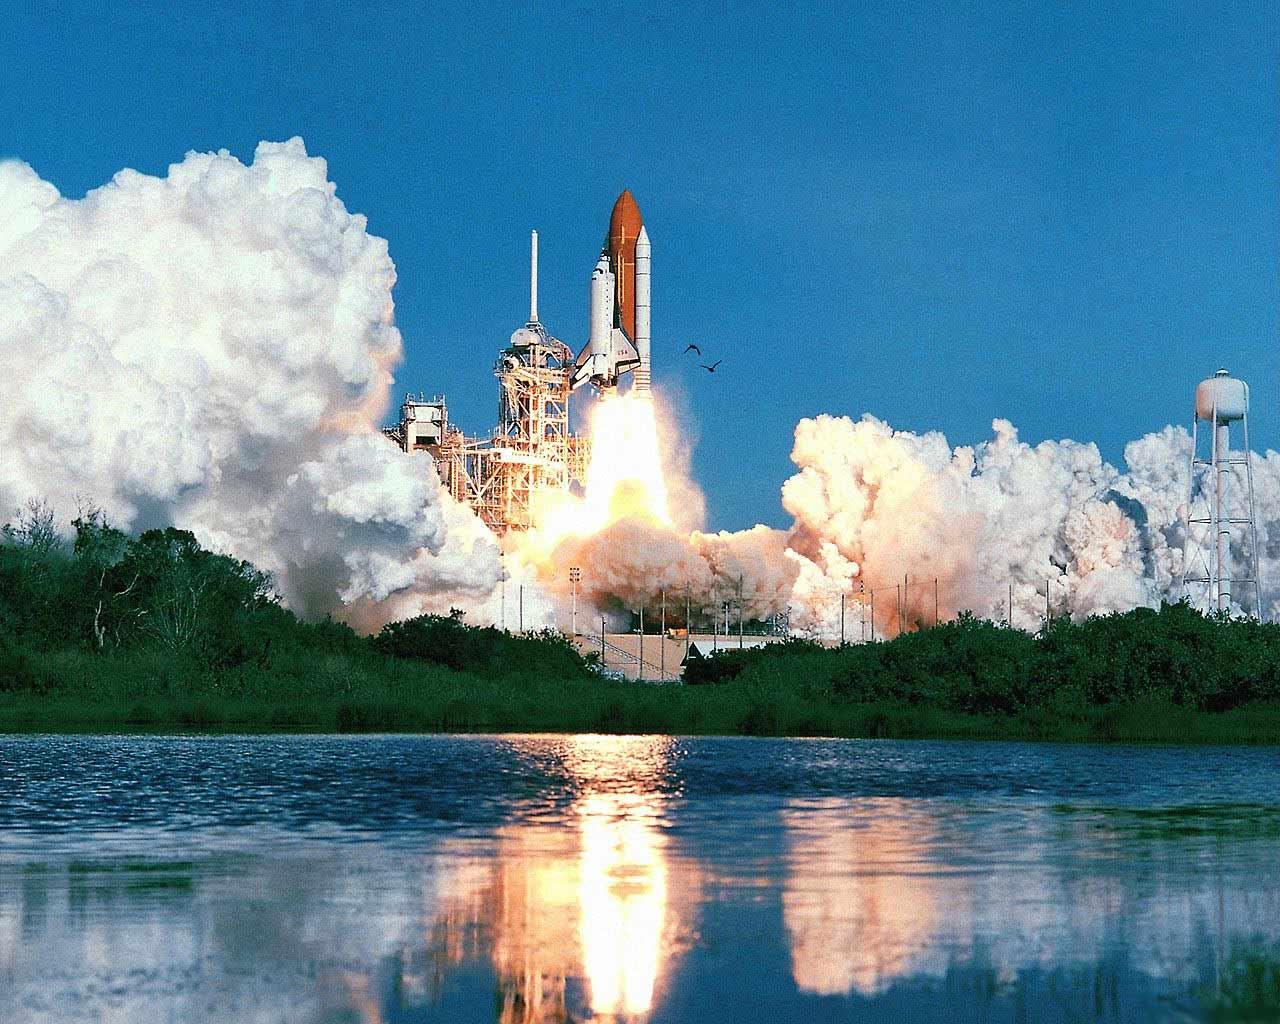 68] Space Shuttle Wallpaper on WallpaperSafari 1280x1024